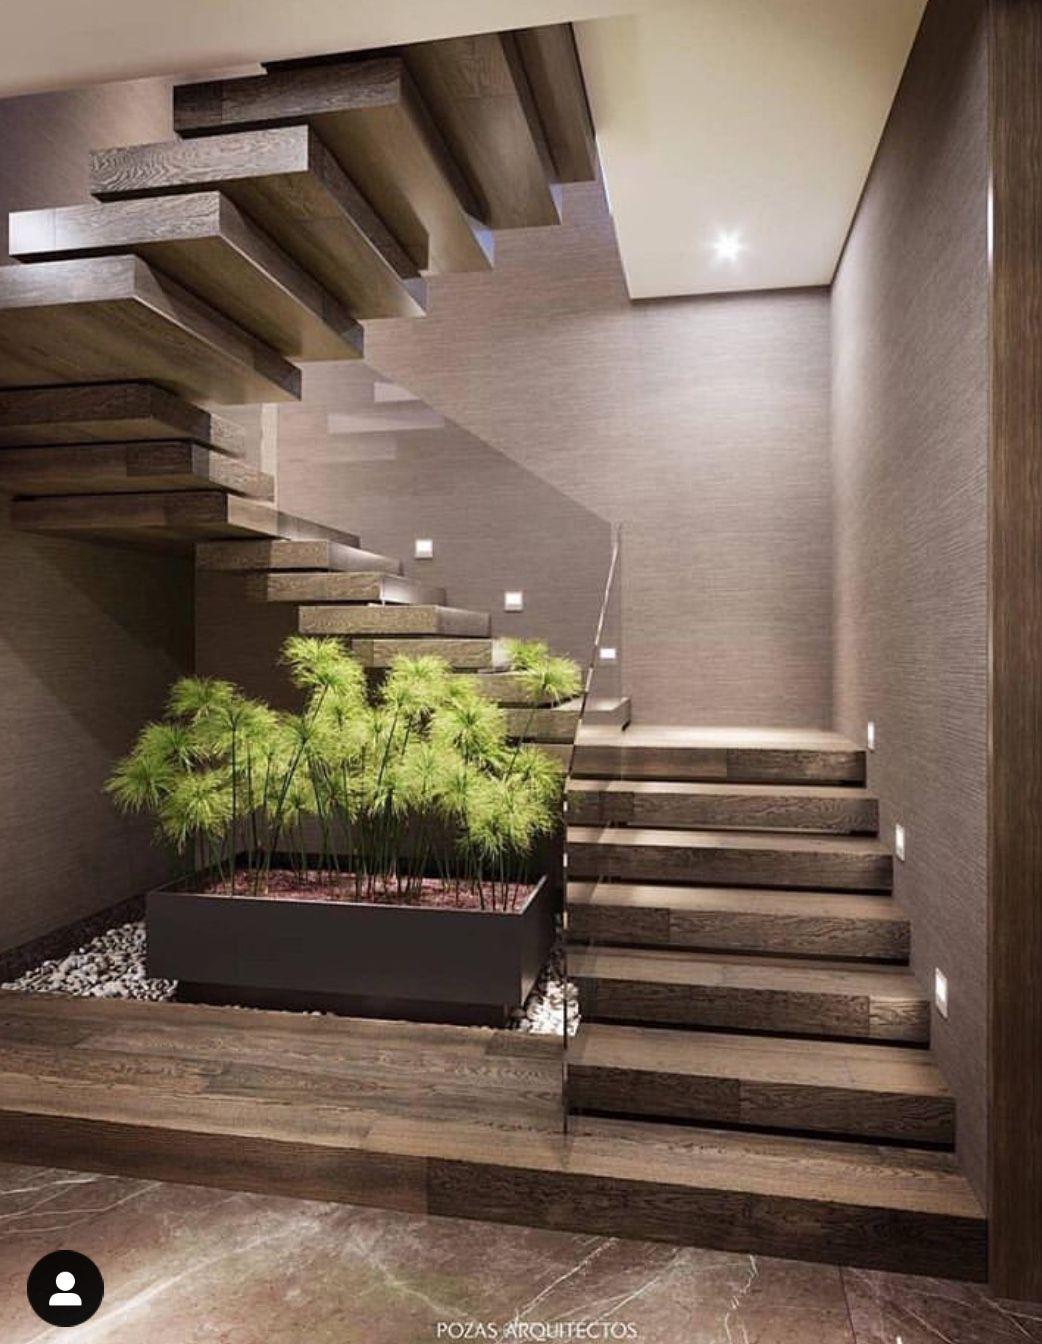 Escada Na Prede Lestnichnye Konstrukcii Blagoustrojstvo Doma Dizajn Lestnicy